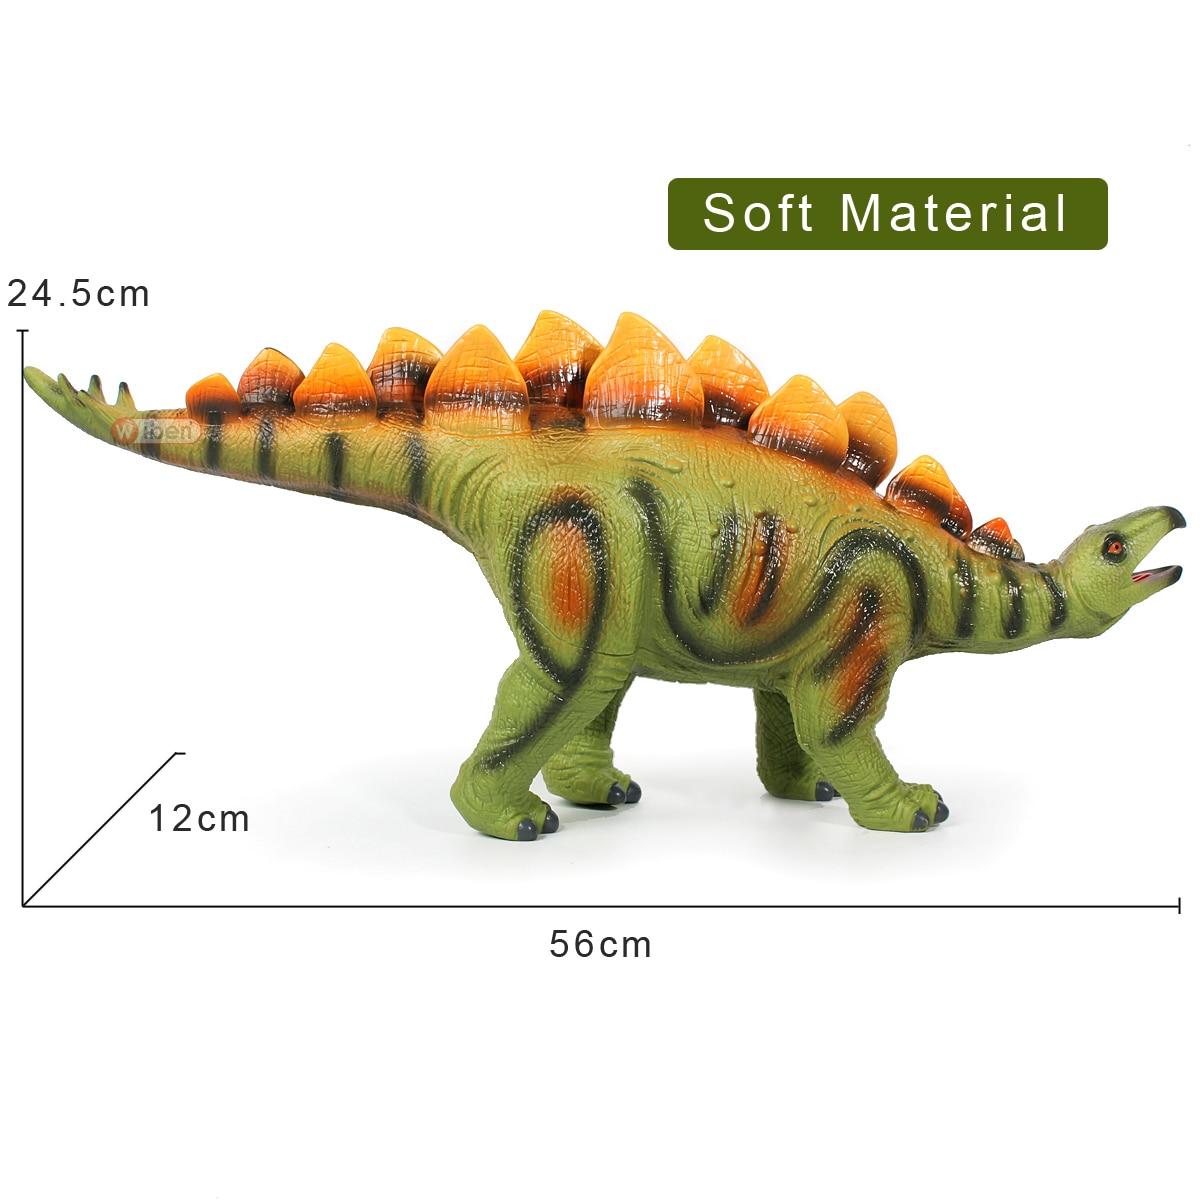 Soft Material Large-size Dinosaur Toys Stegosaurus Plastic Figures Jurrassic